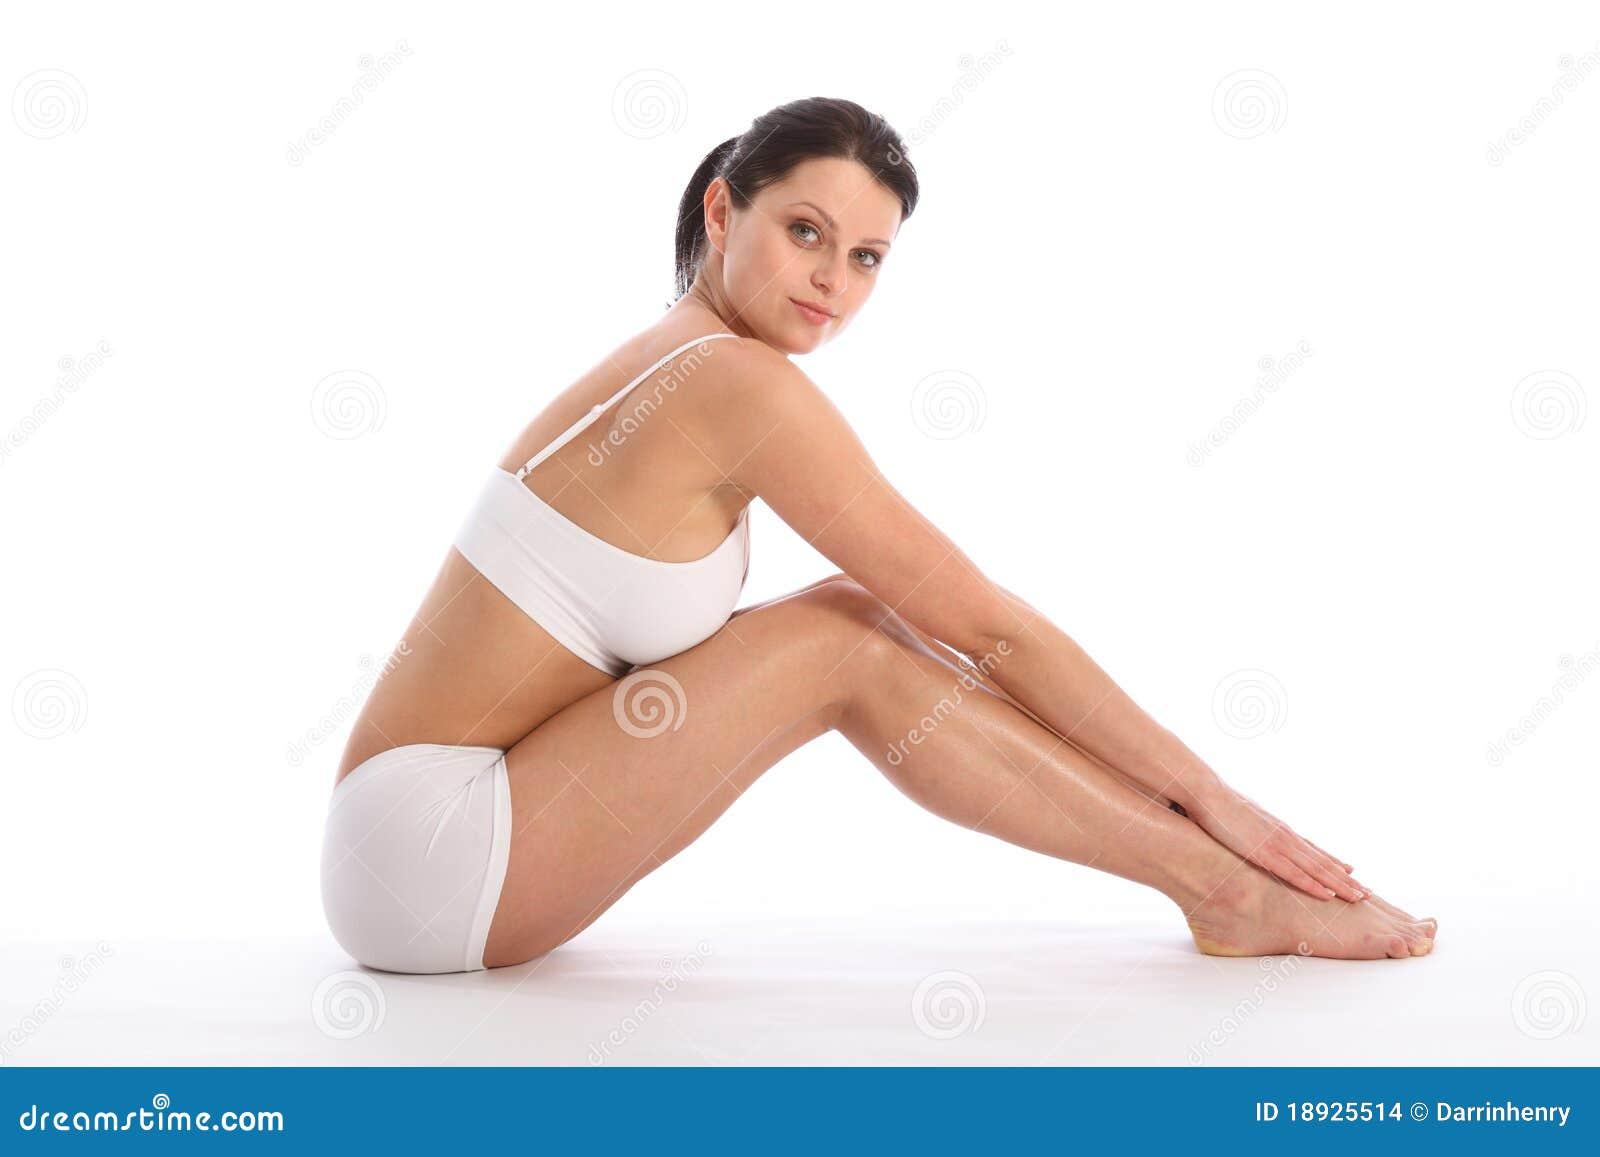 slim gujju girls sex video